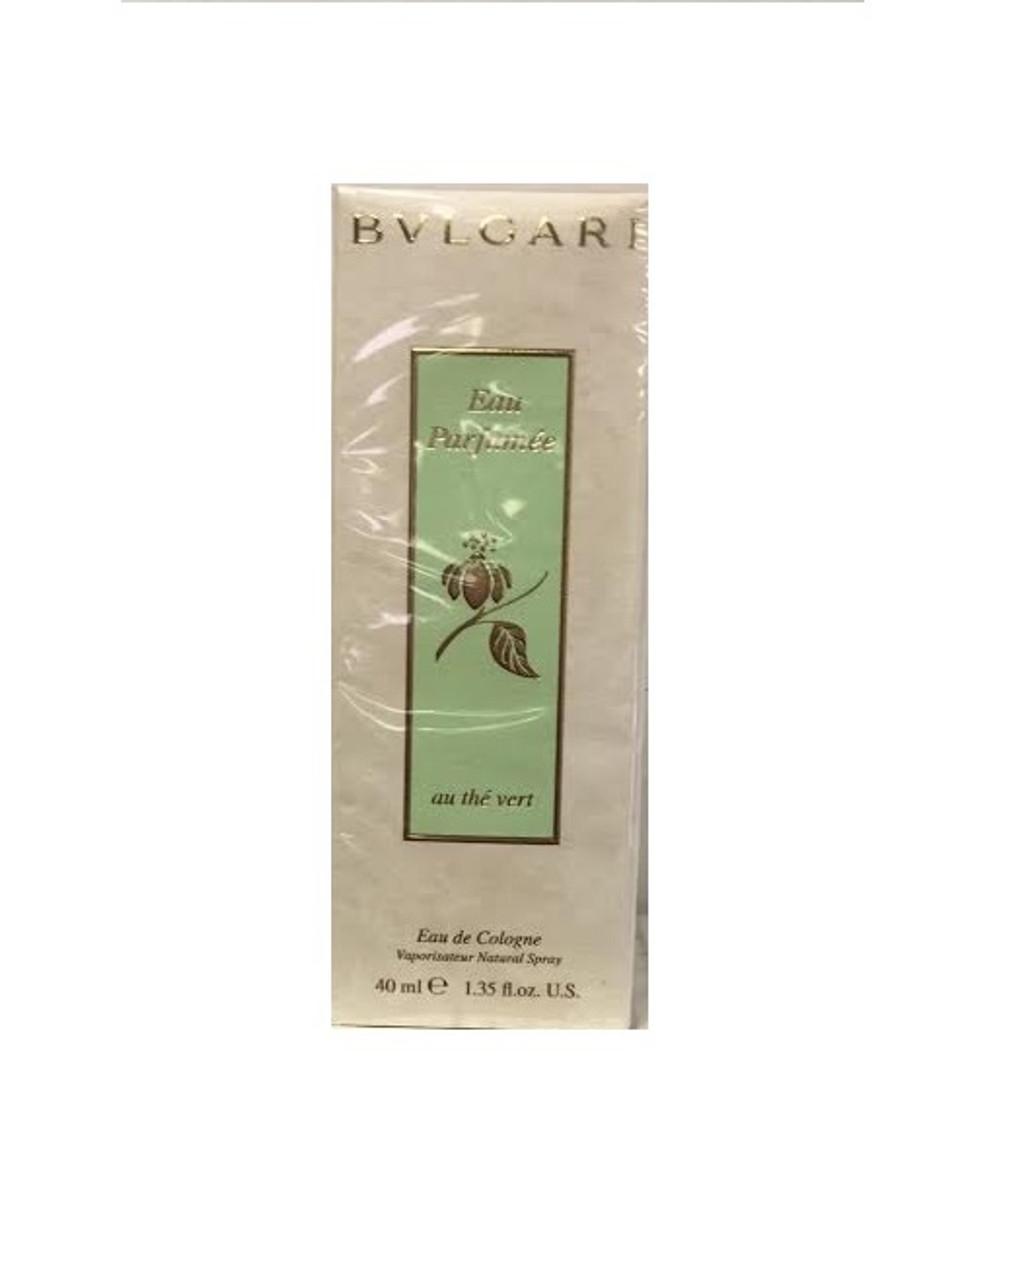 Bvlgari Eau Parfumee Eau De Cologne Unisex Spray 135 Oz Perfume Depot